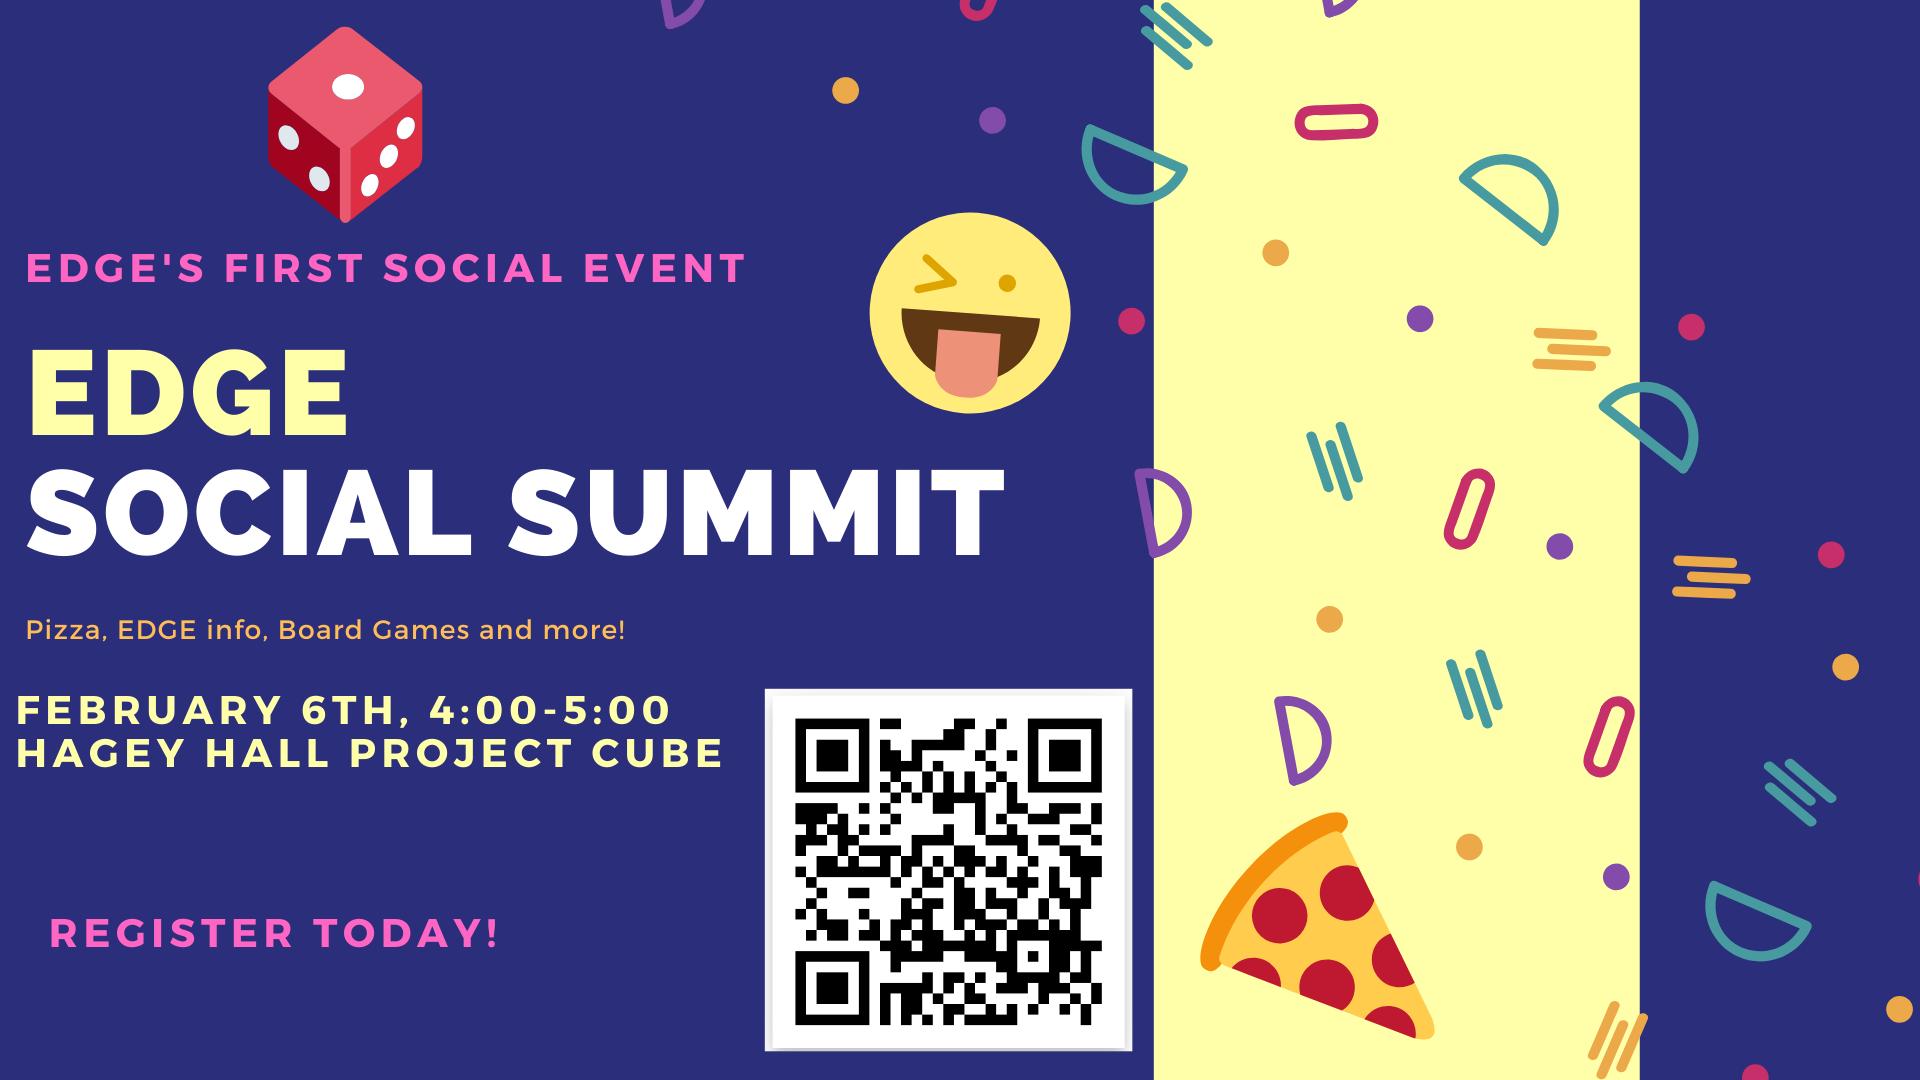 EDGE social summit poster